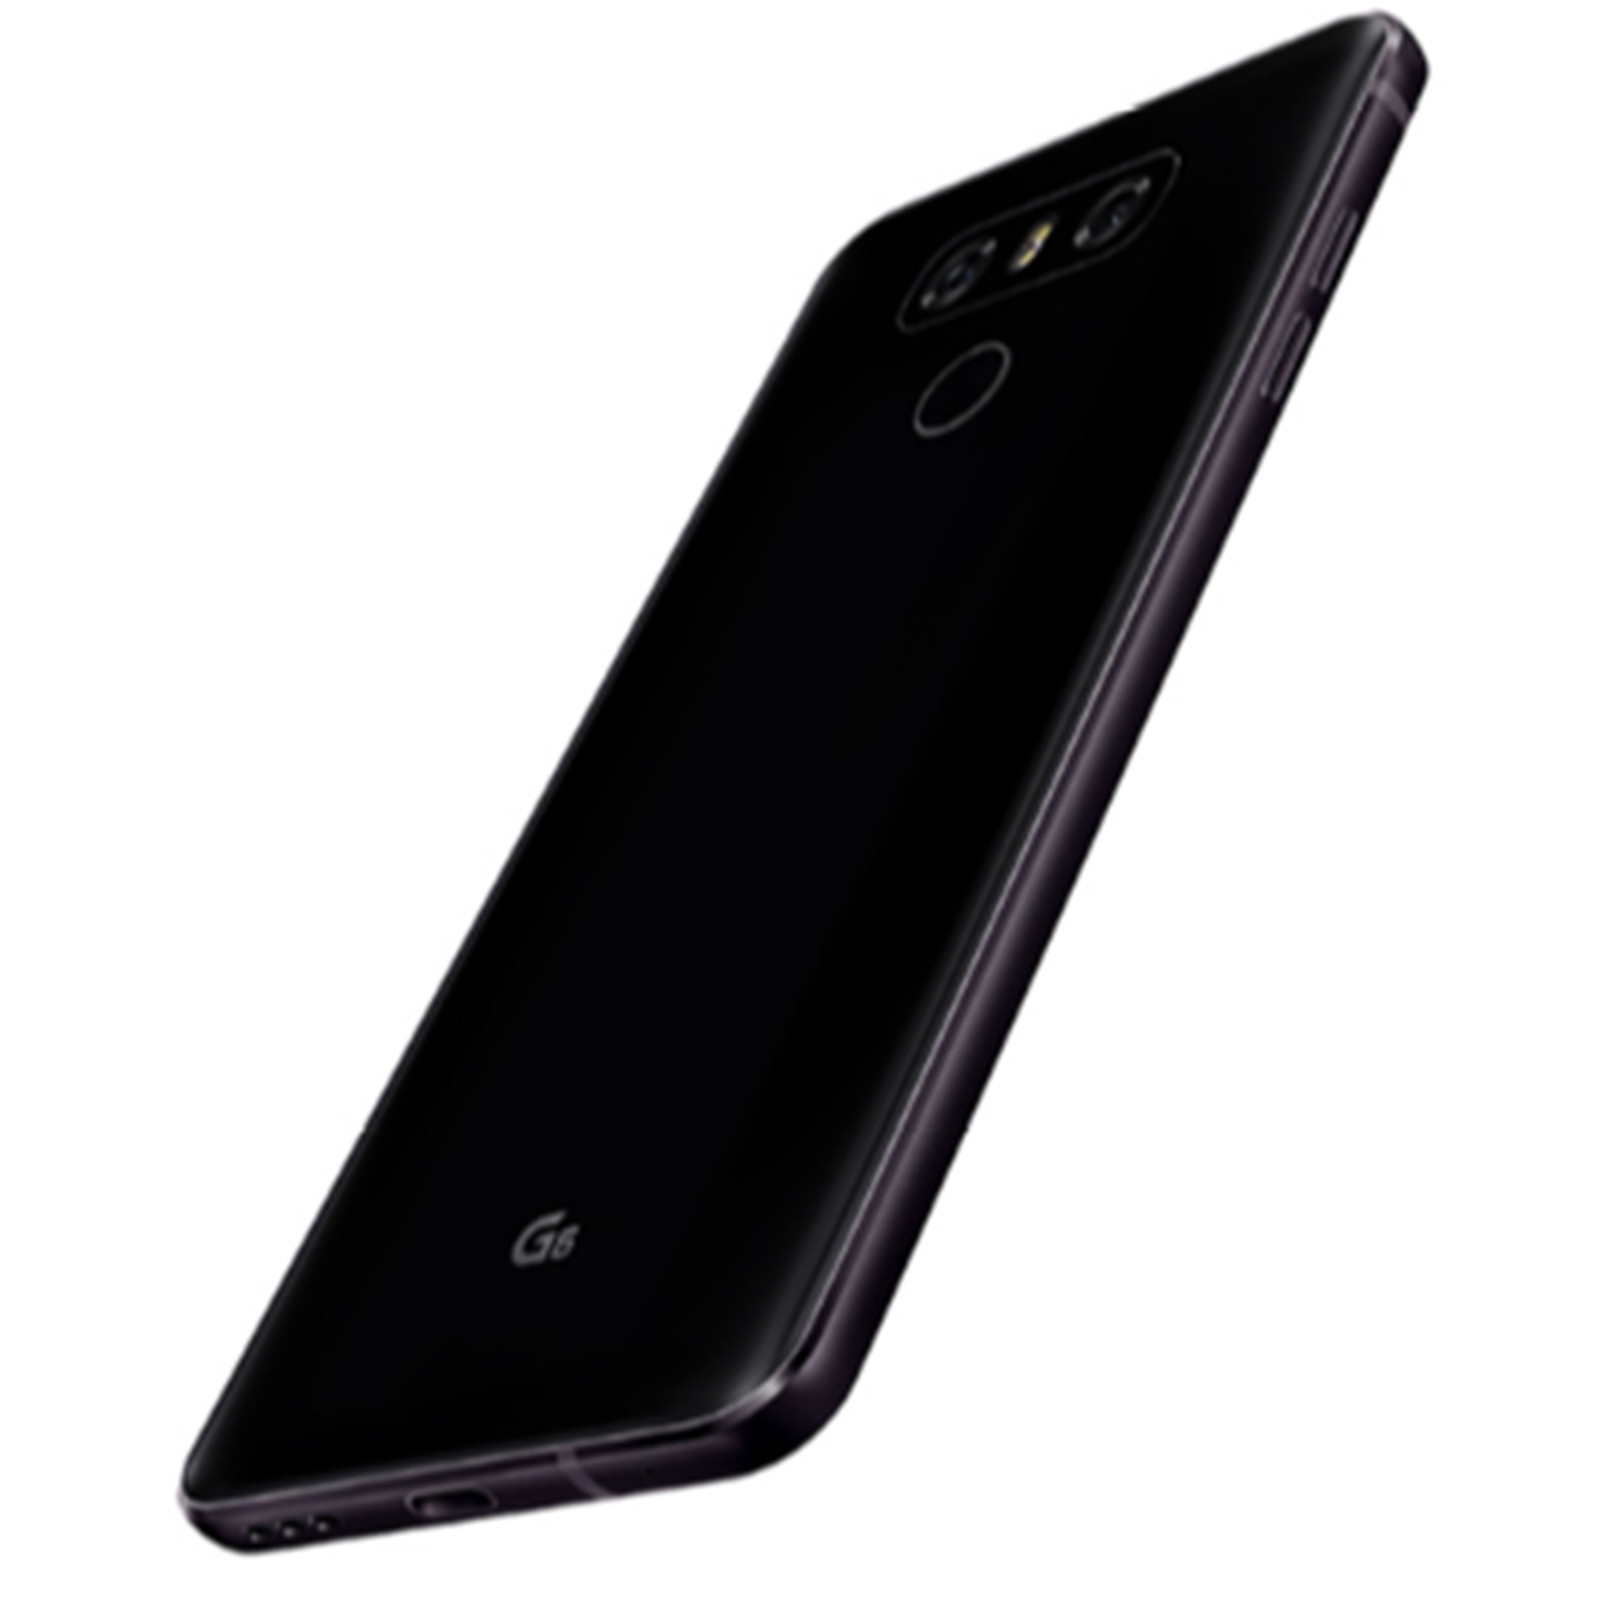 Buy the LG G6 Dual SIM Smartphone 64GB - Astro Black - with